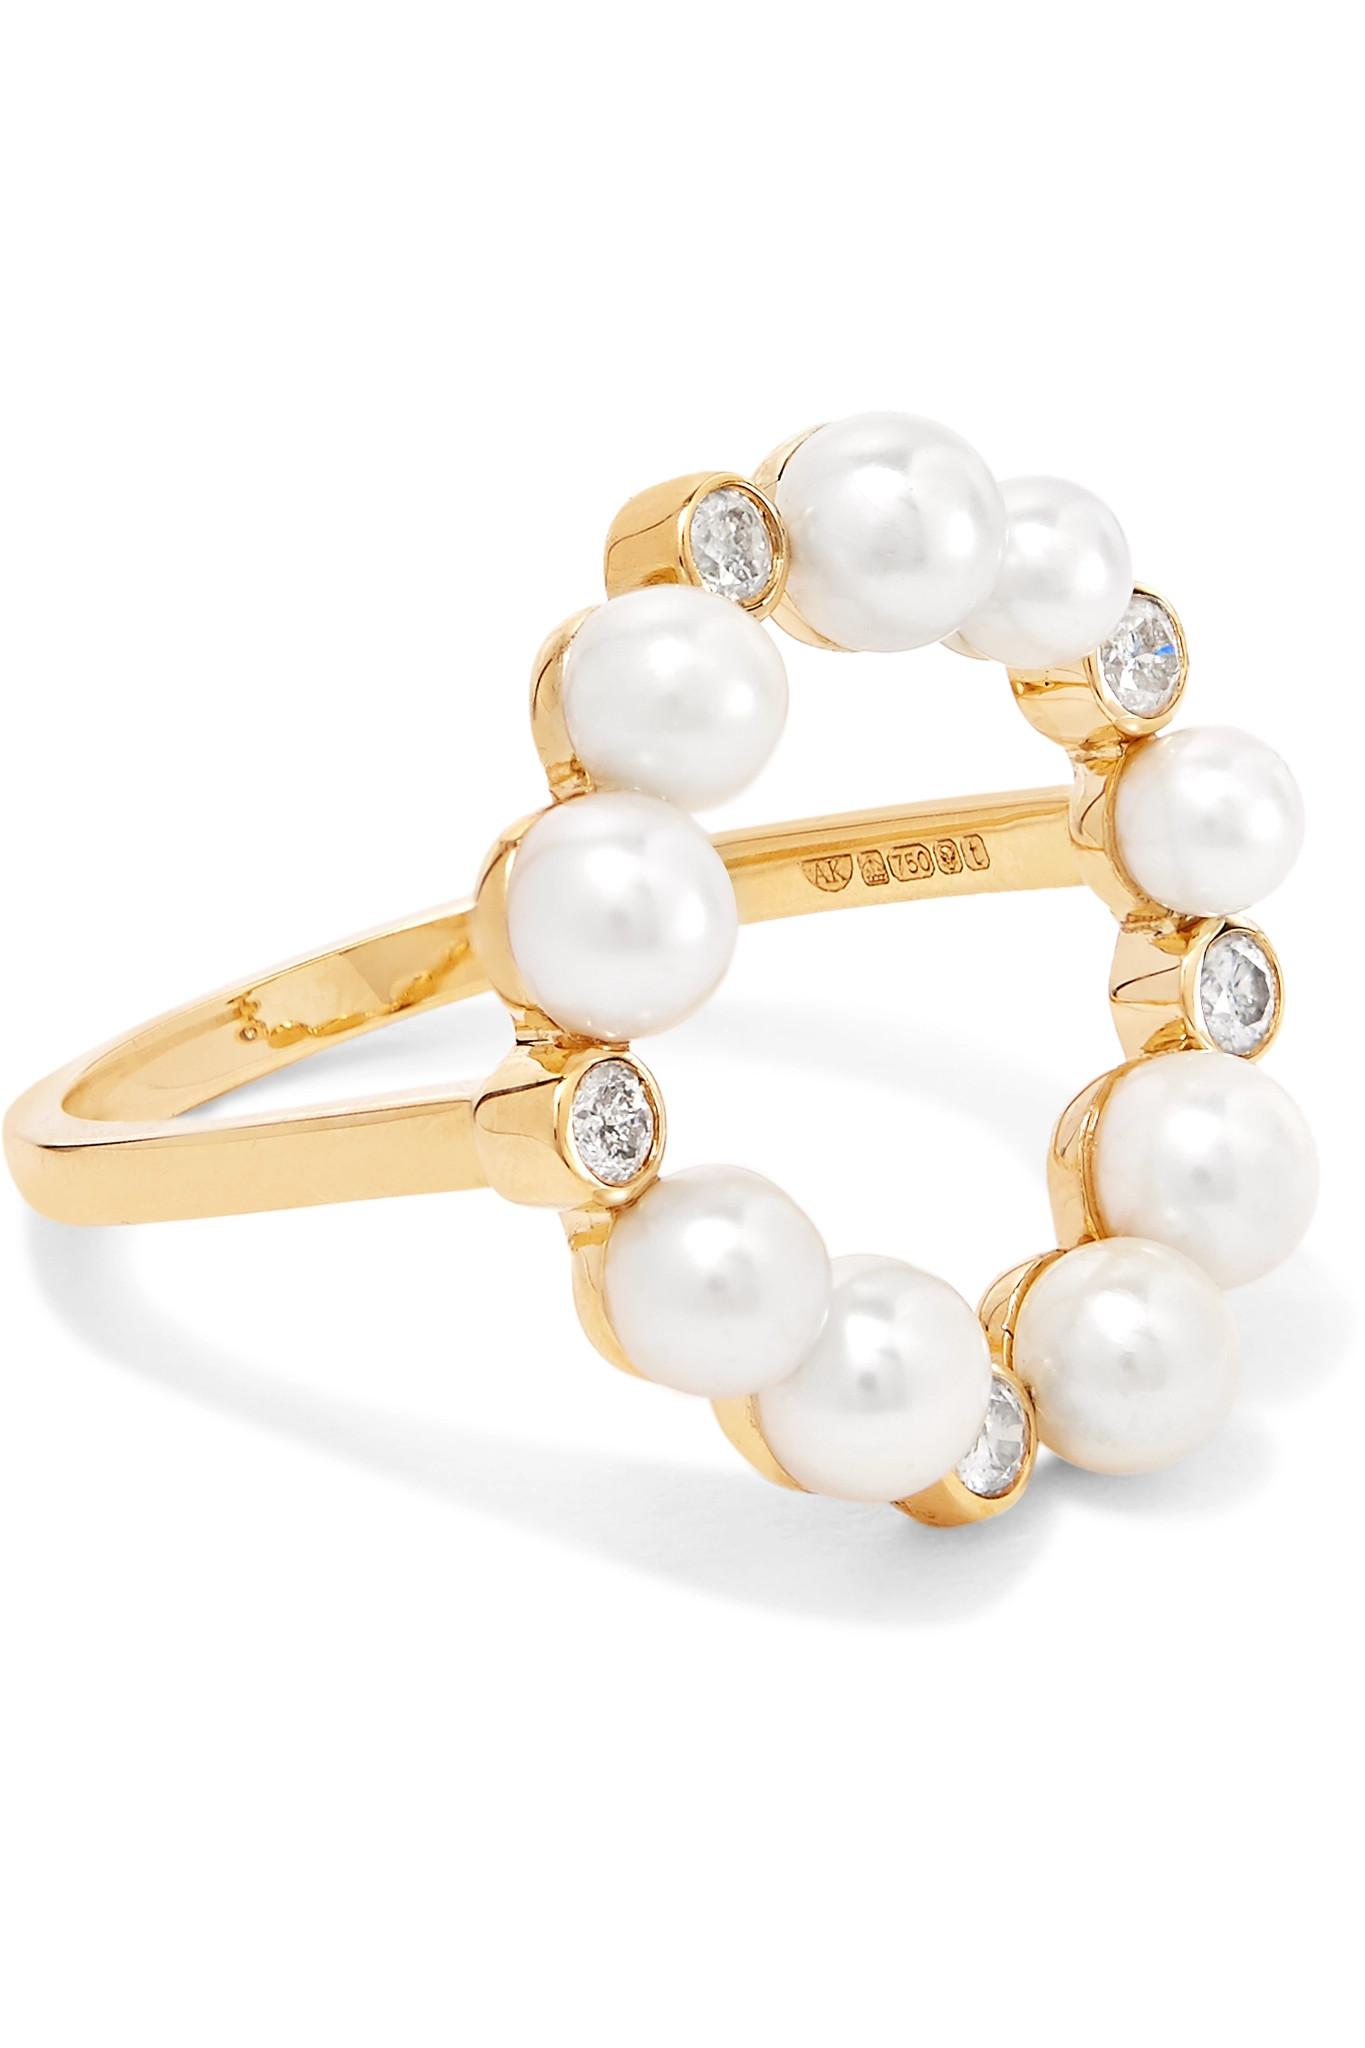 Lyst Anissa Kermiche Rond De Perle 18 Karat Gold Diamond And